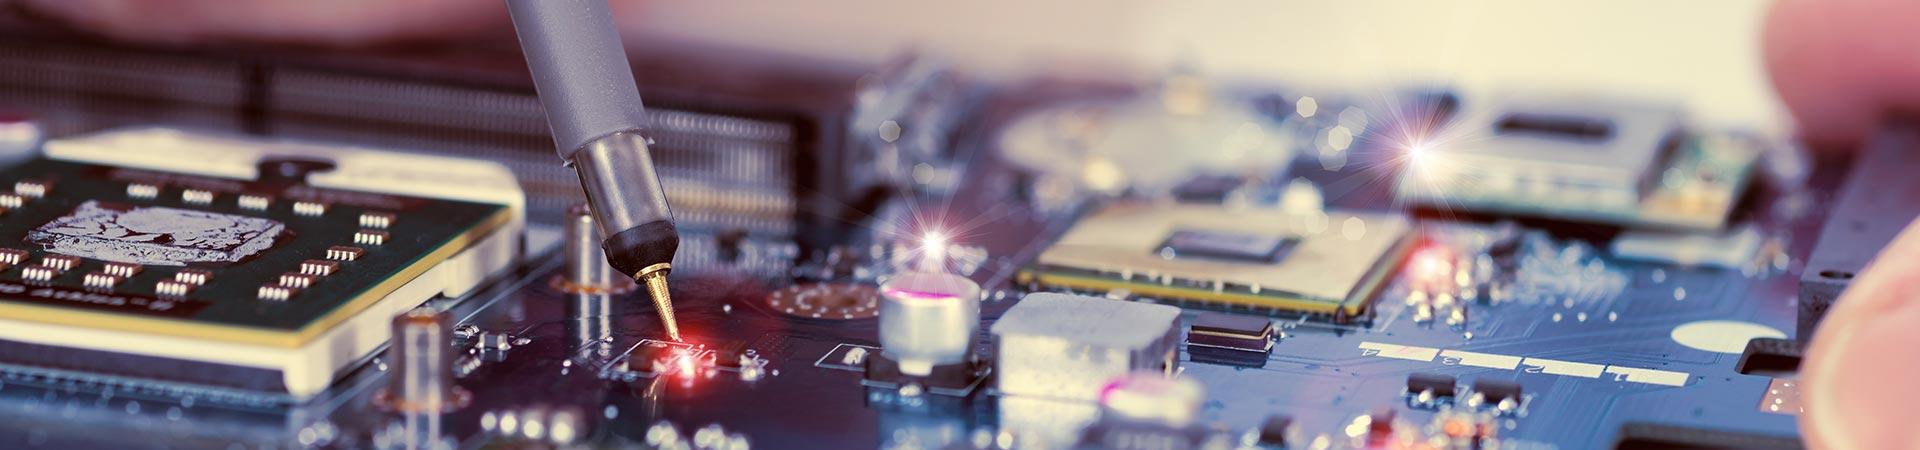 Electronics_header_interior_desktop_2